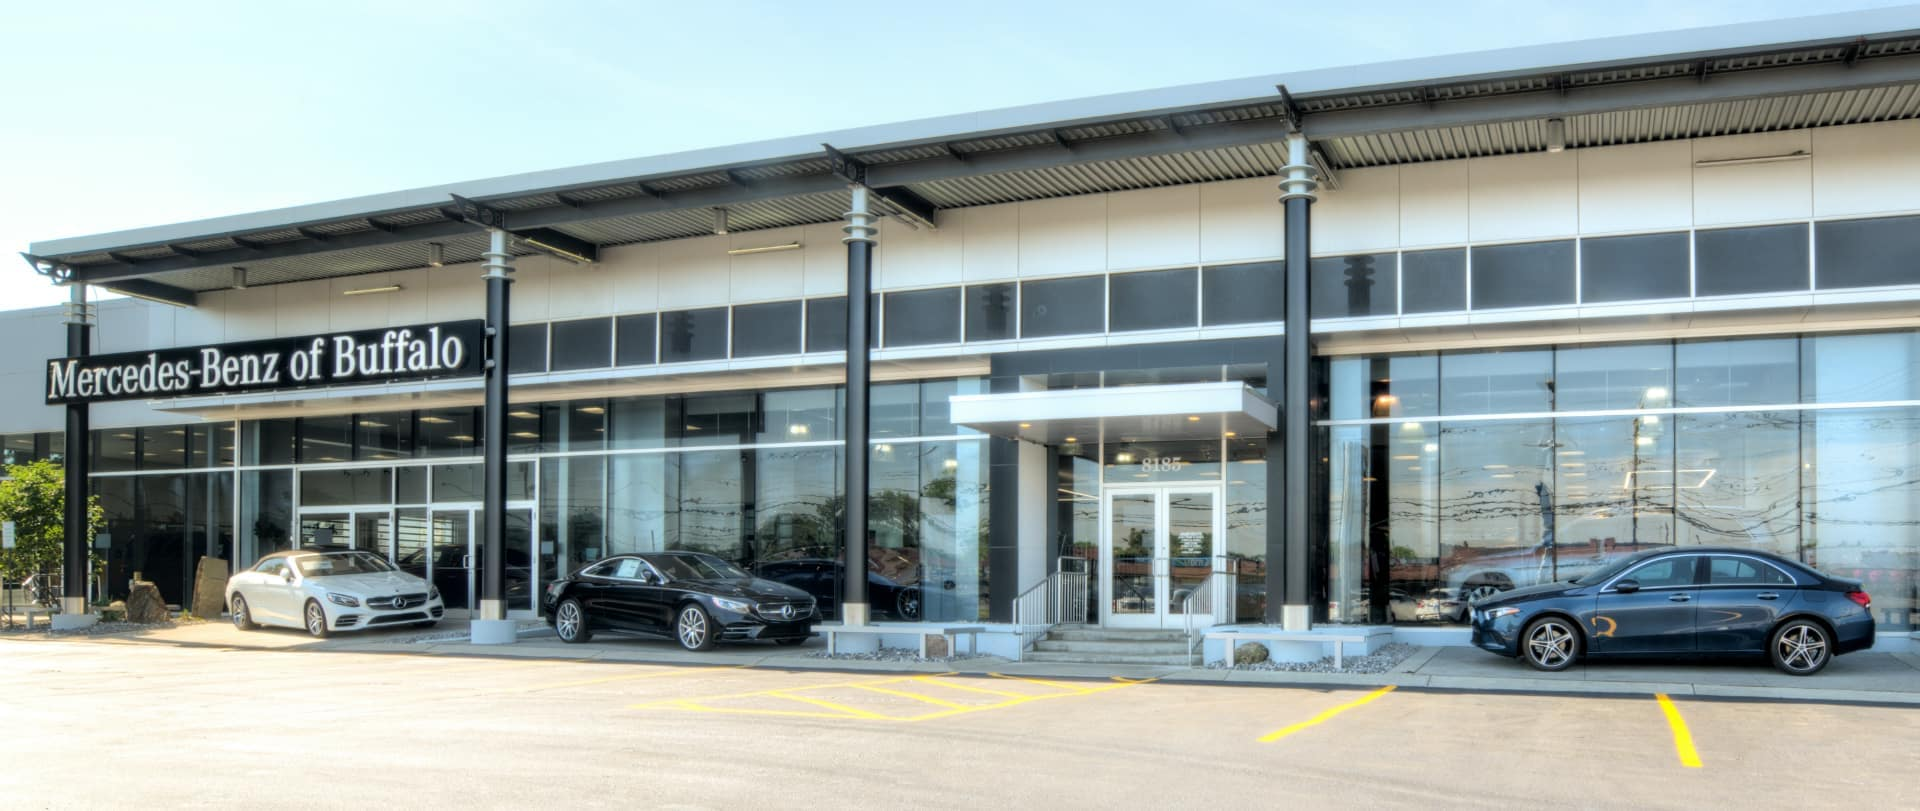 Mercedes Benz Dealers >> Mercedes Benz Of Buffalo Mercedes Benz Dealer In Williamsville Ny